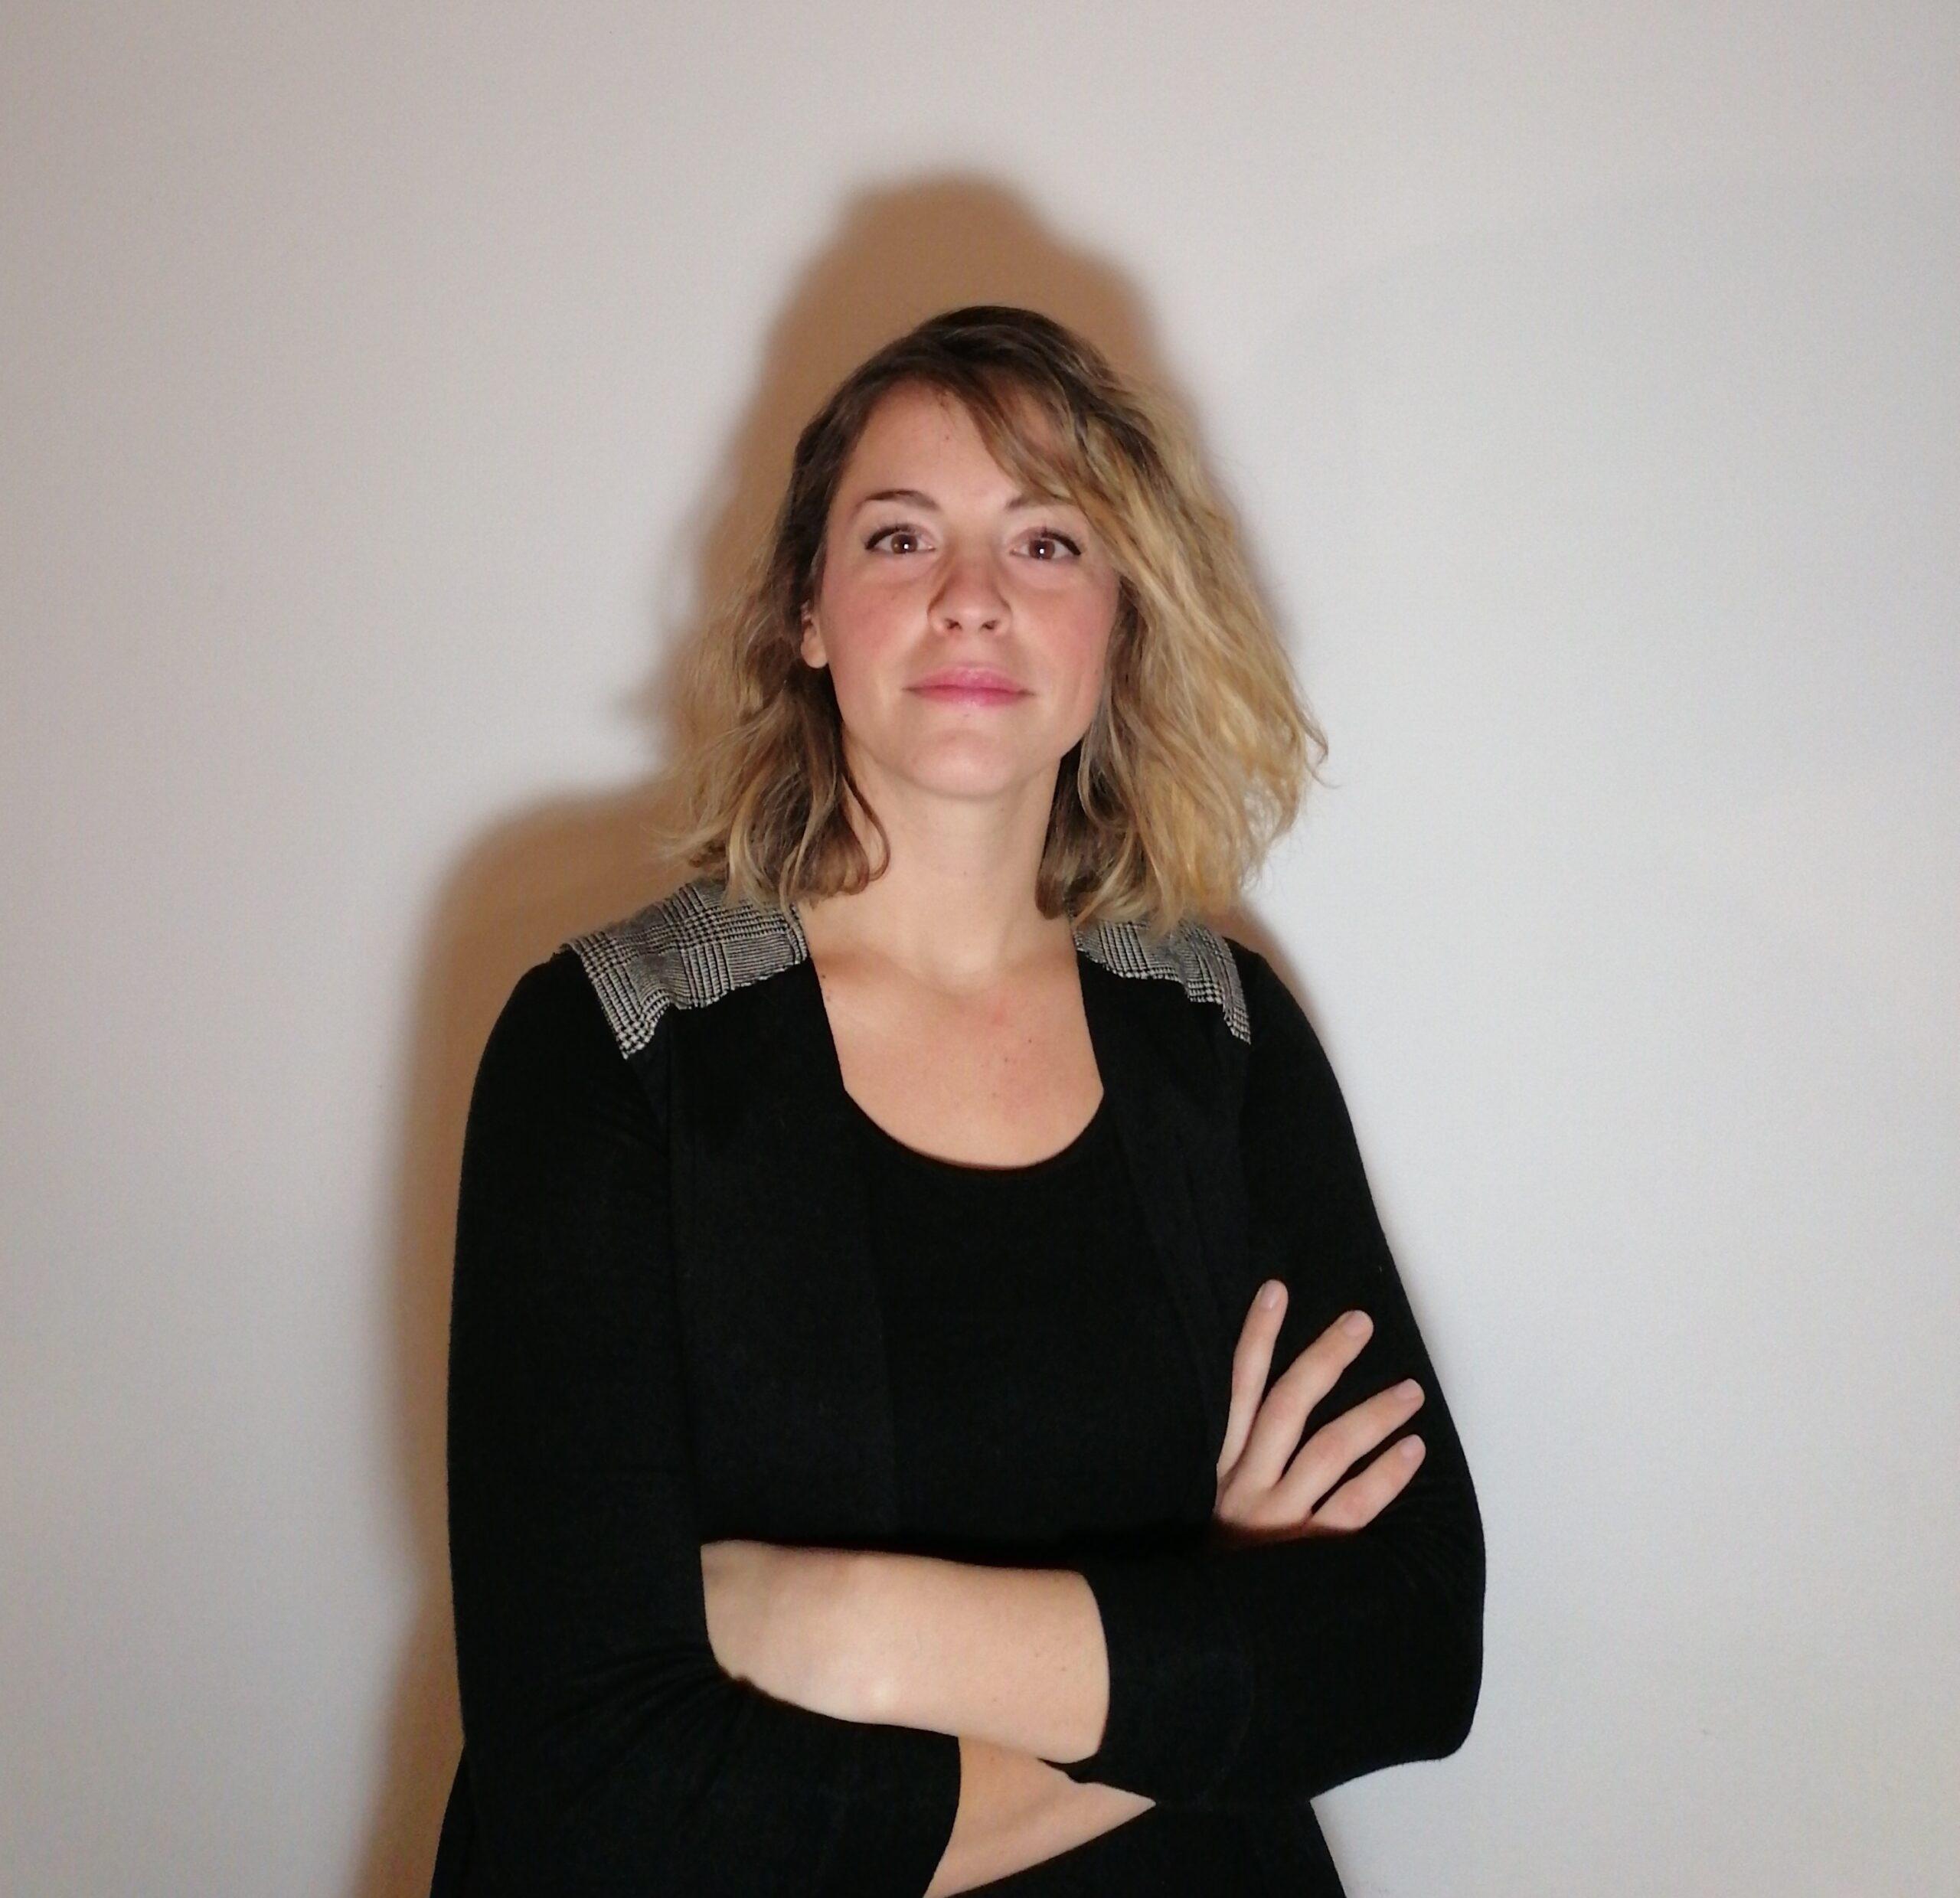 Lisa Polencic